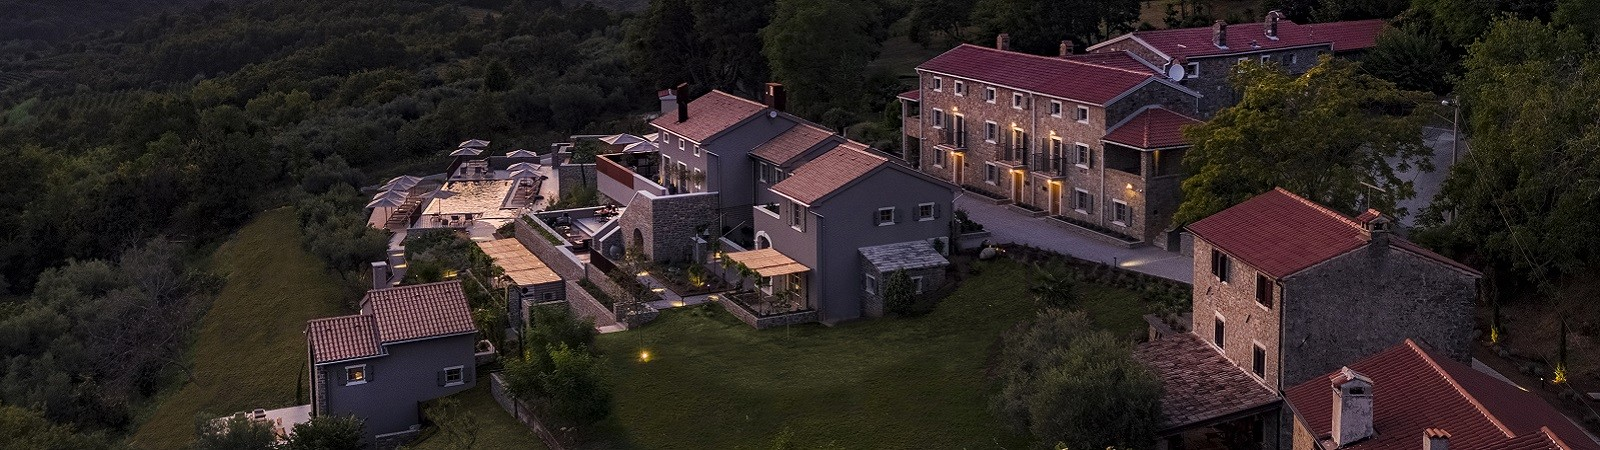 SAN CANZIAN VILLAGE & HOTEL - Istria